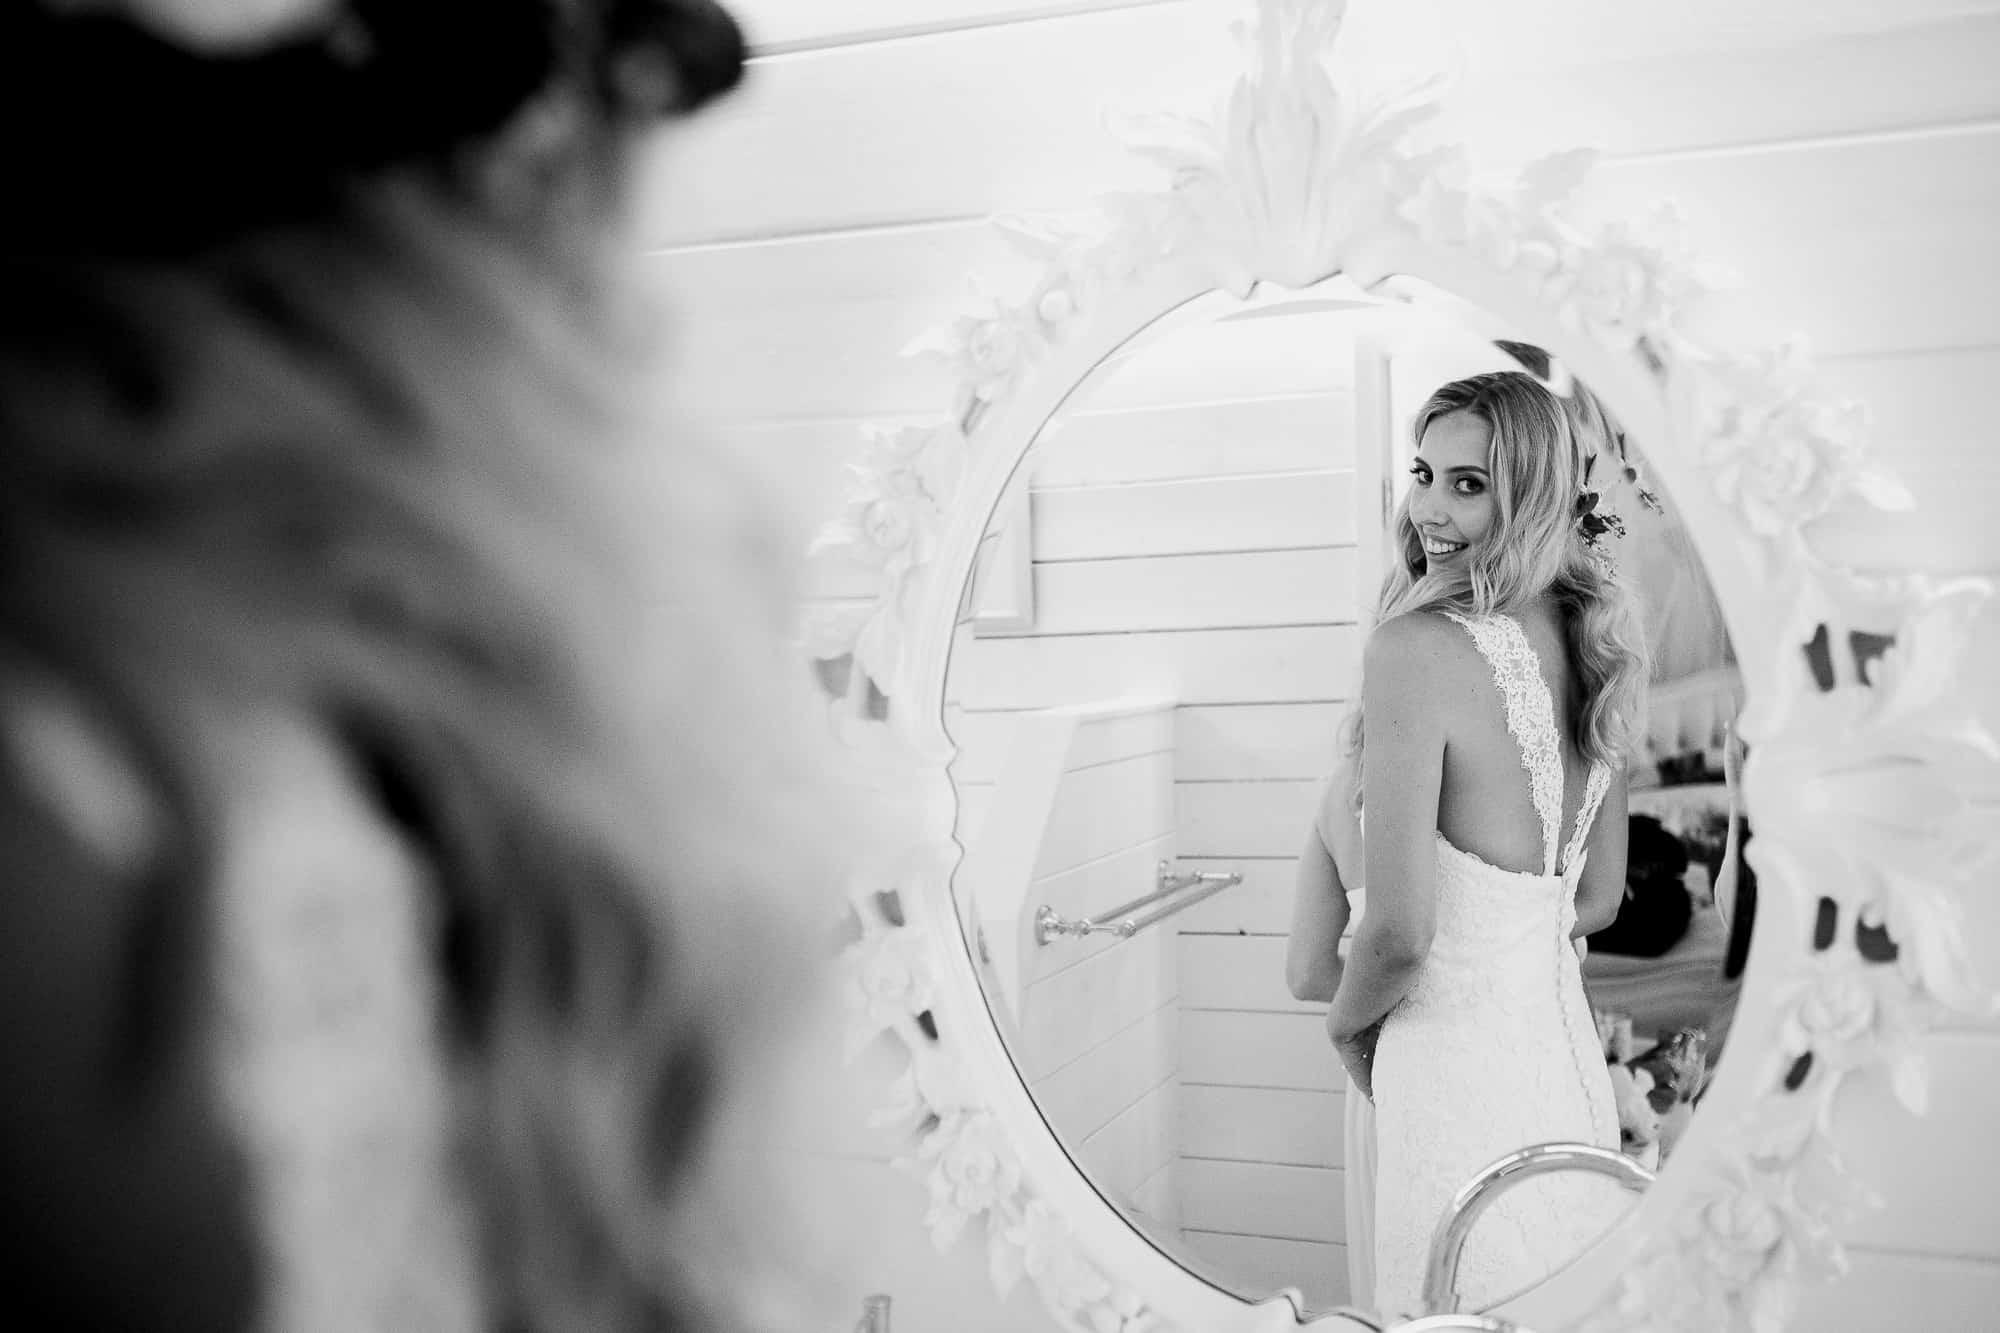 marleybrook-house-wedding-photography-matt-tyler-0018